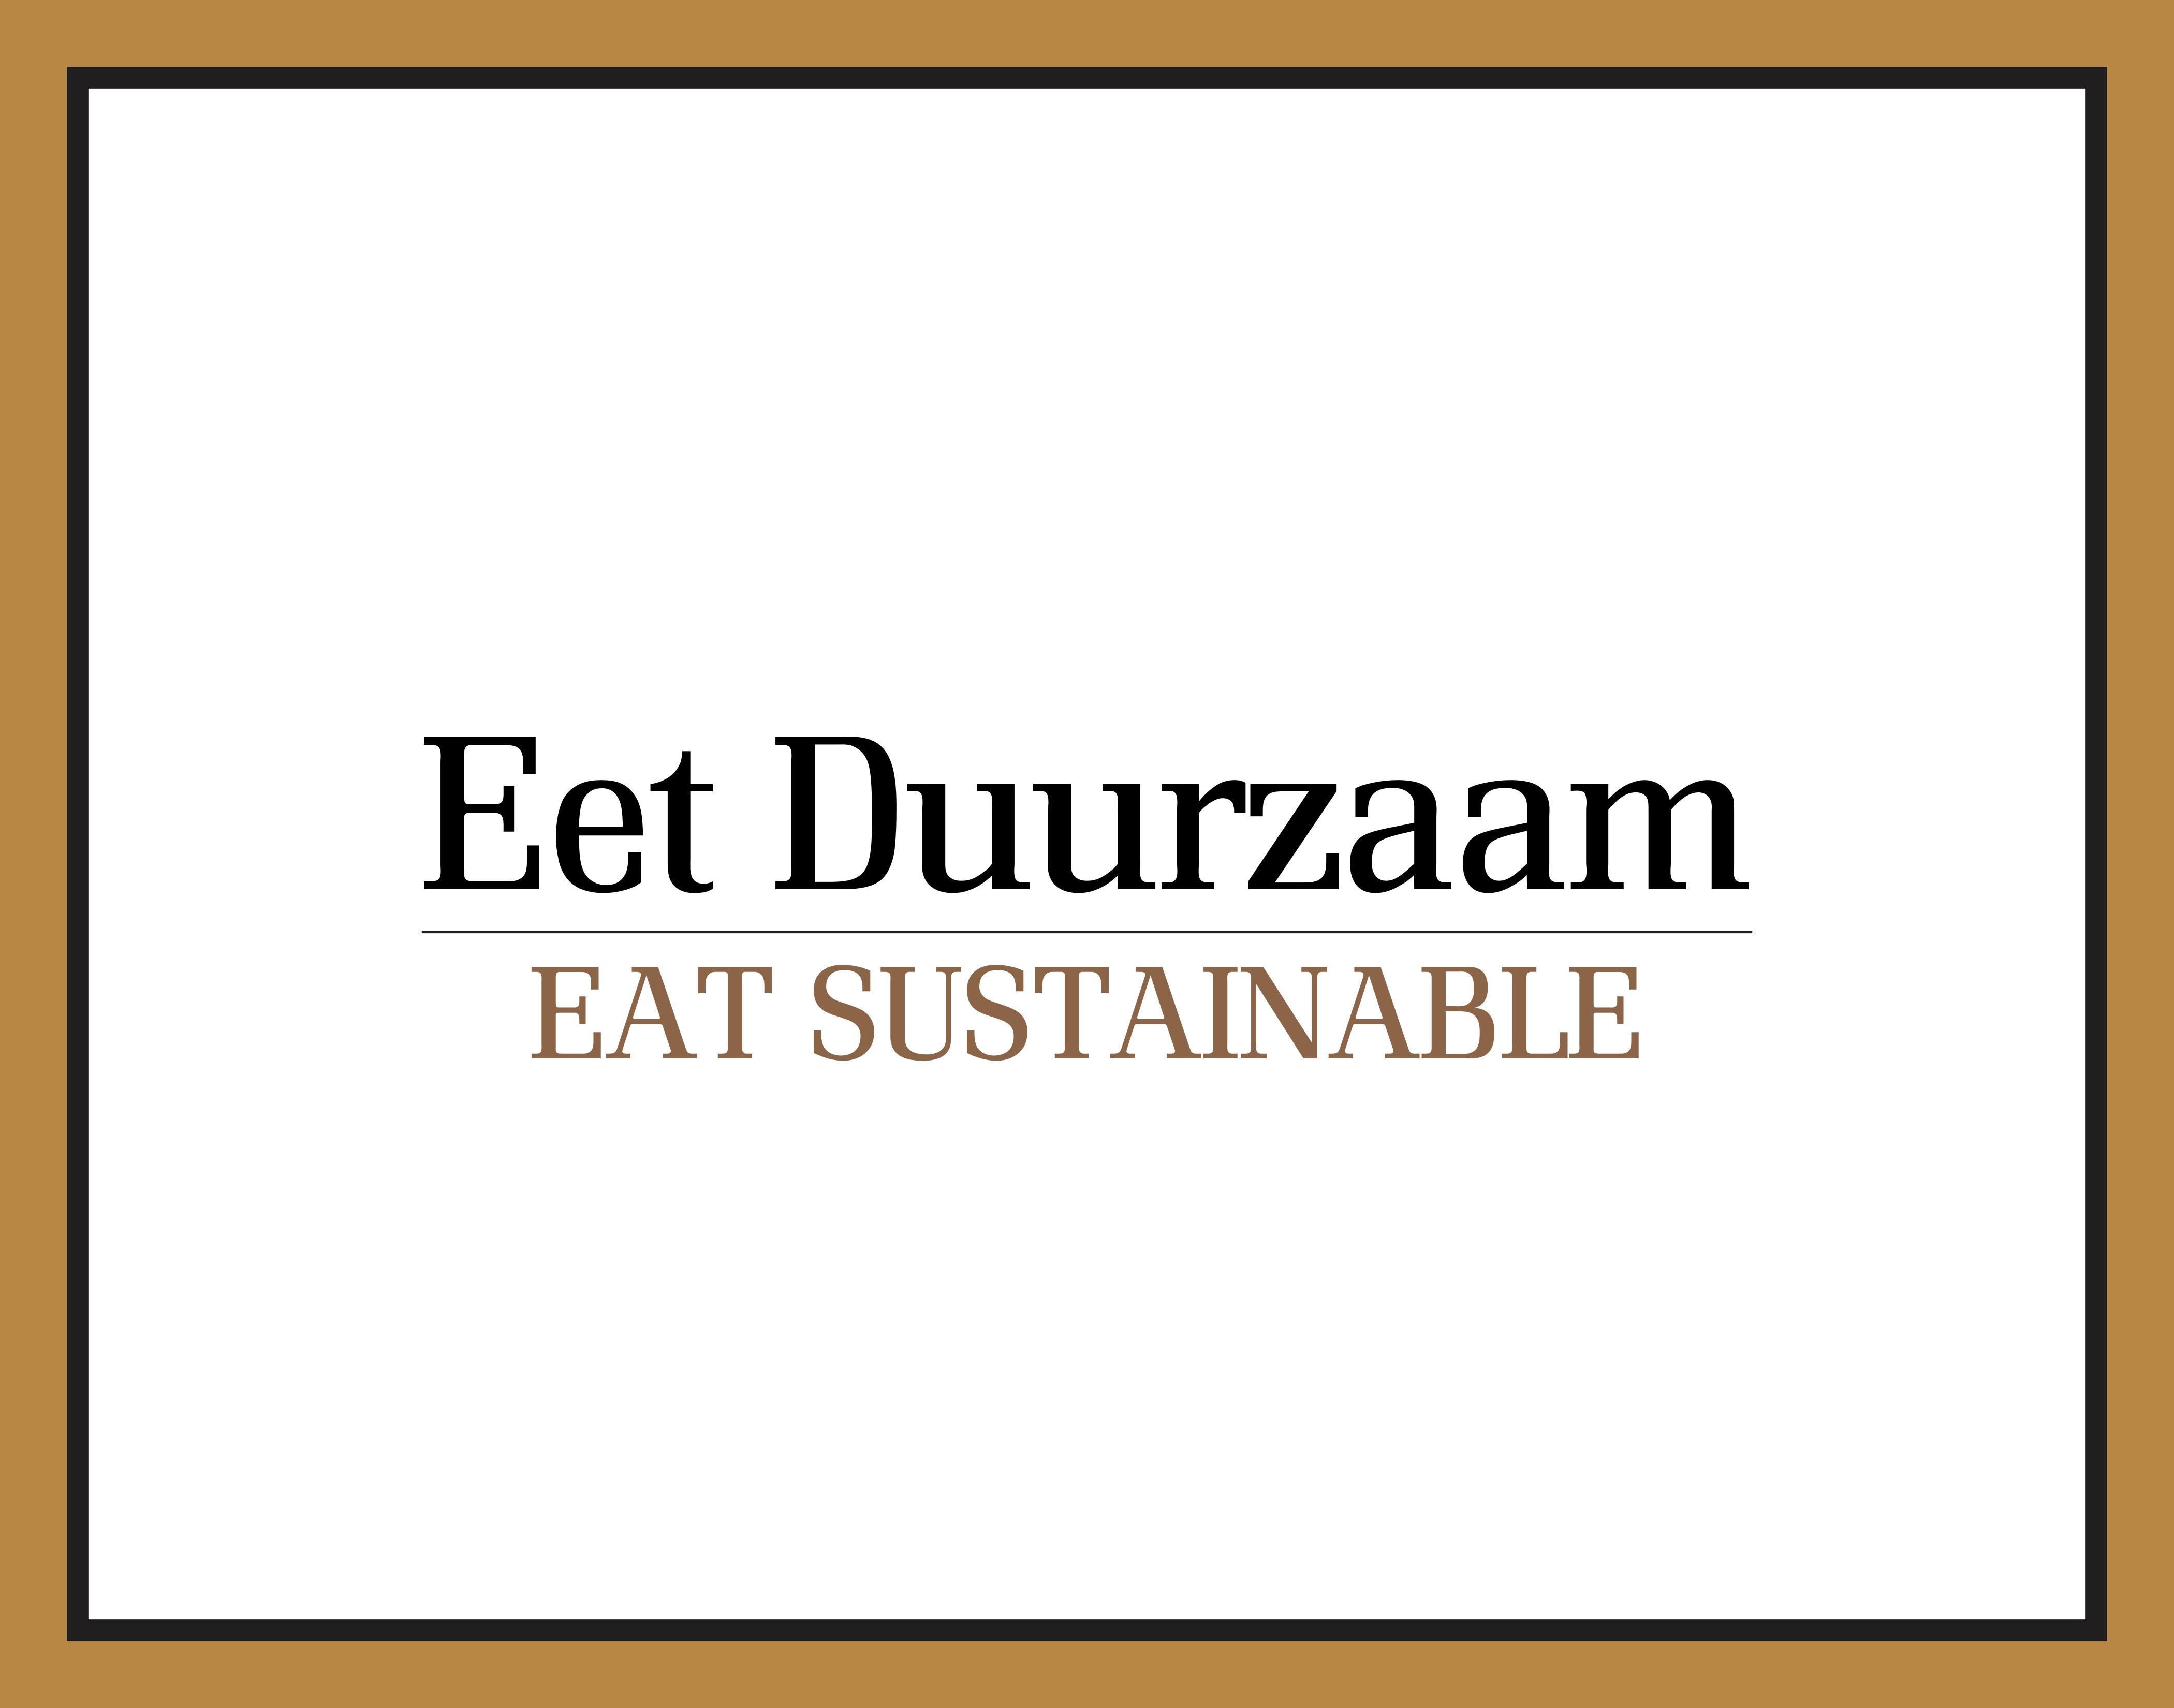 Eet Duurzaam